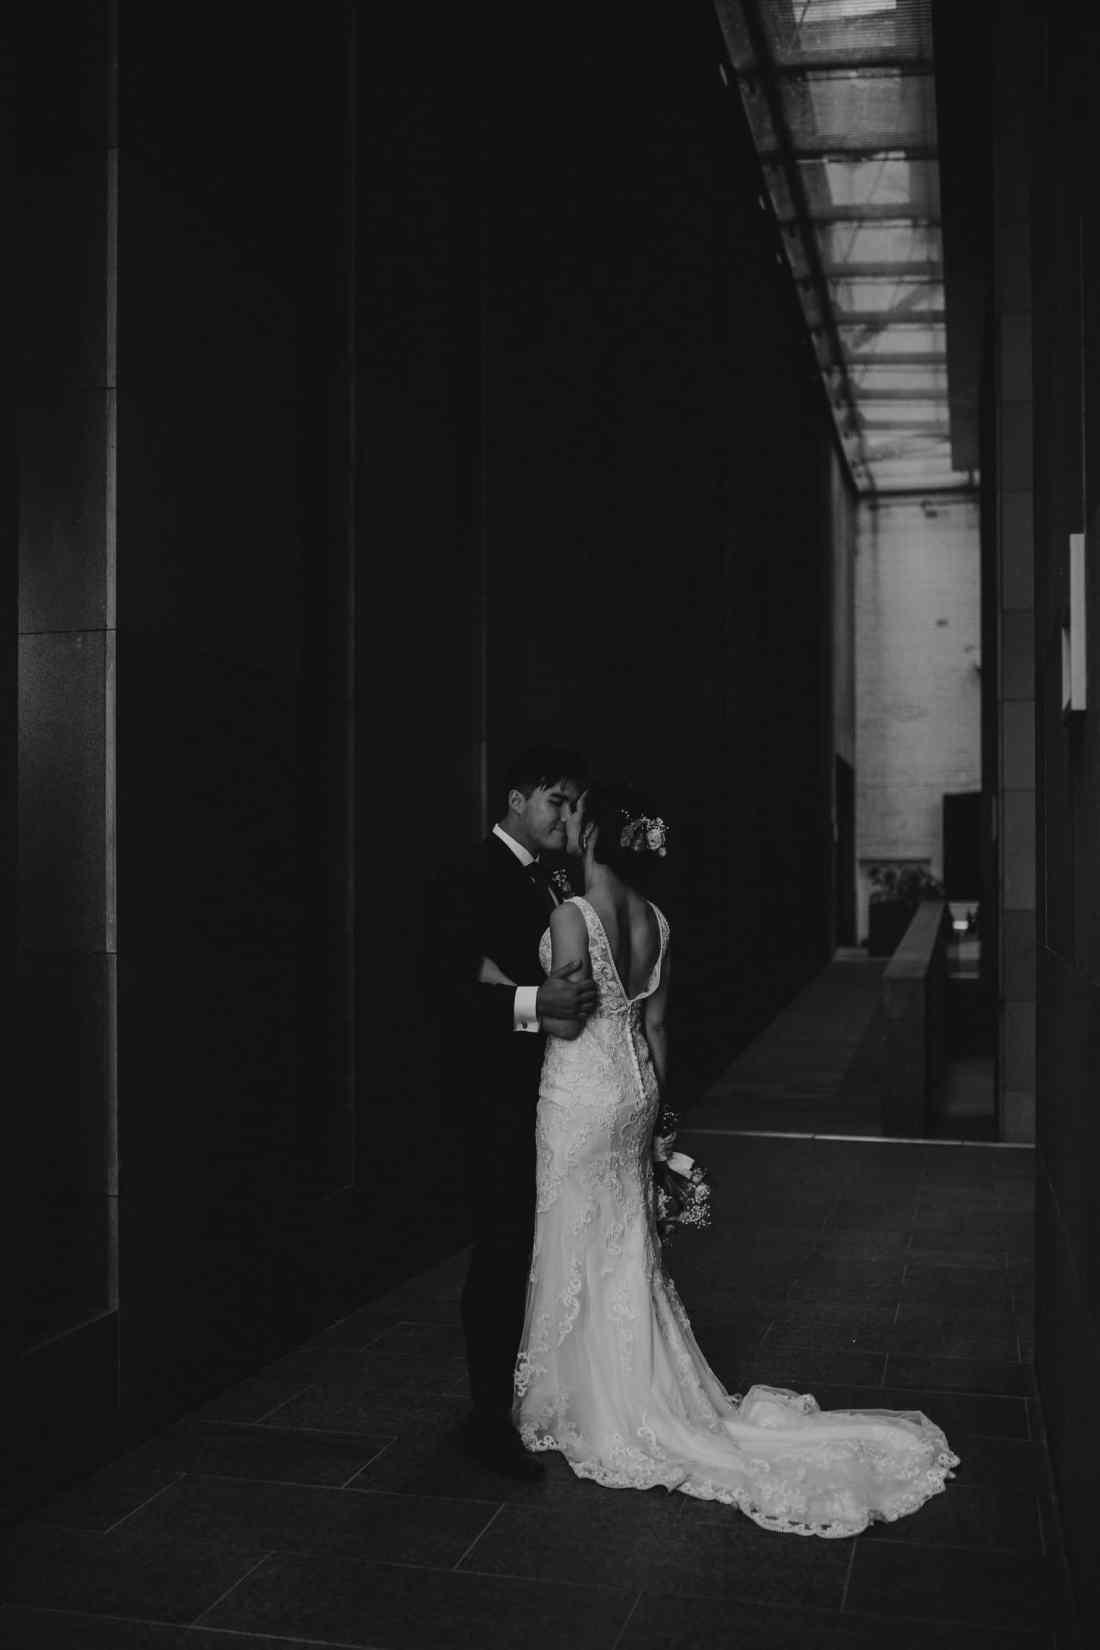 Ebony Blush Photography | Perth Wedding Photographer | Photography + Film | Sandalford Winery | Como Treasury Wedding | Perth City Wedding |Alex + Mel83